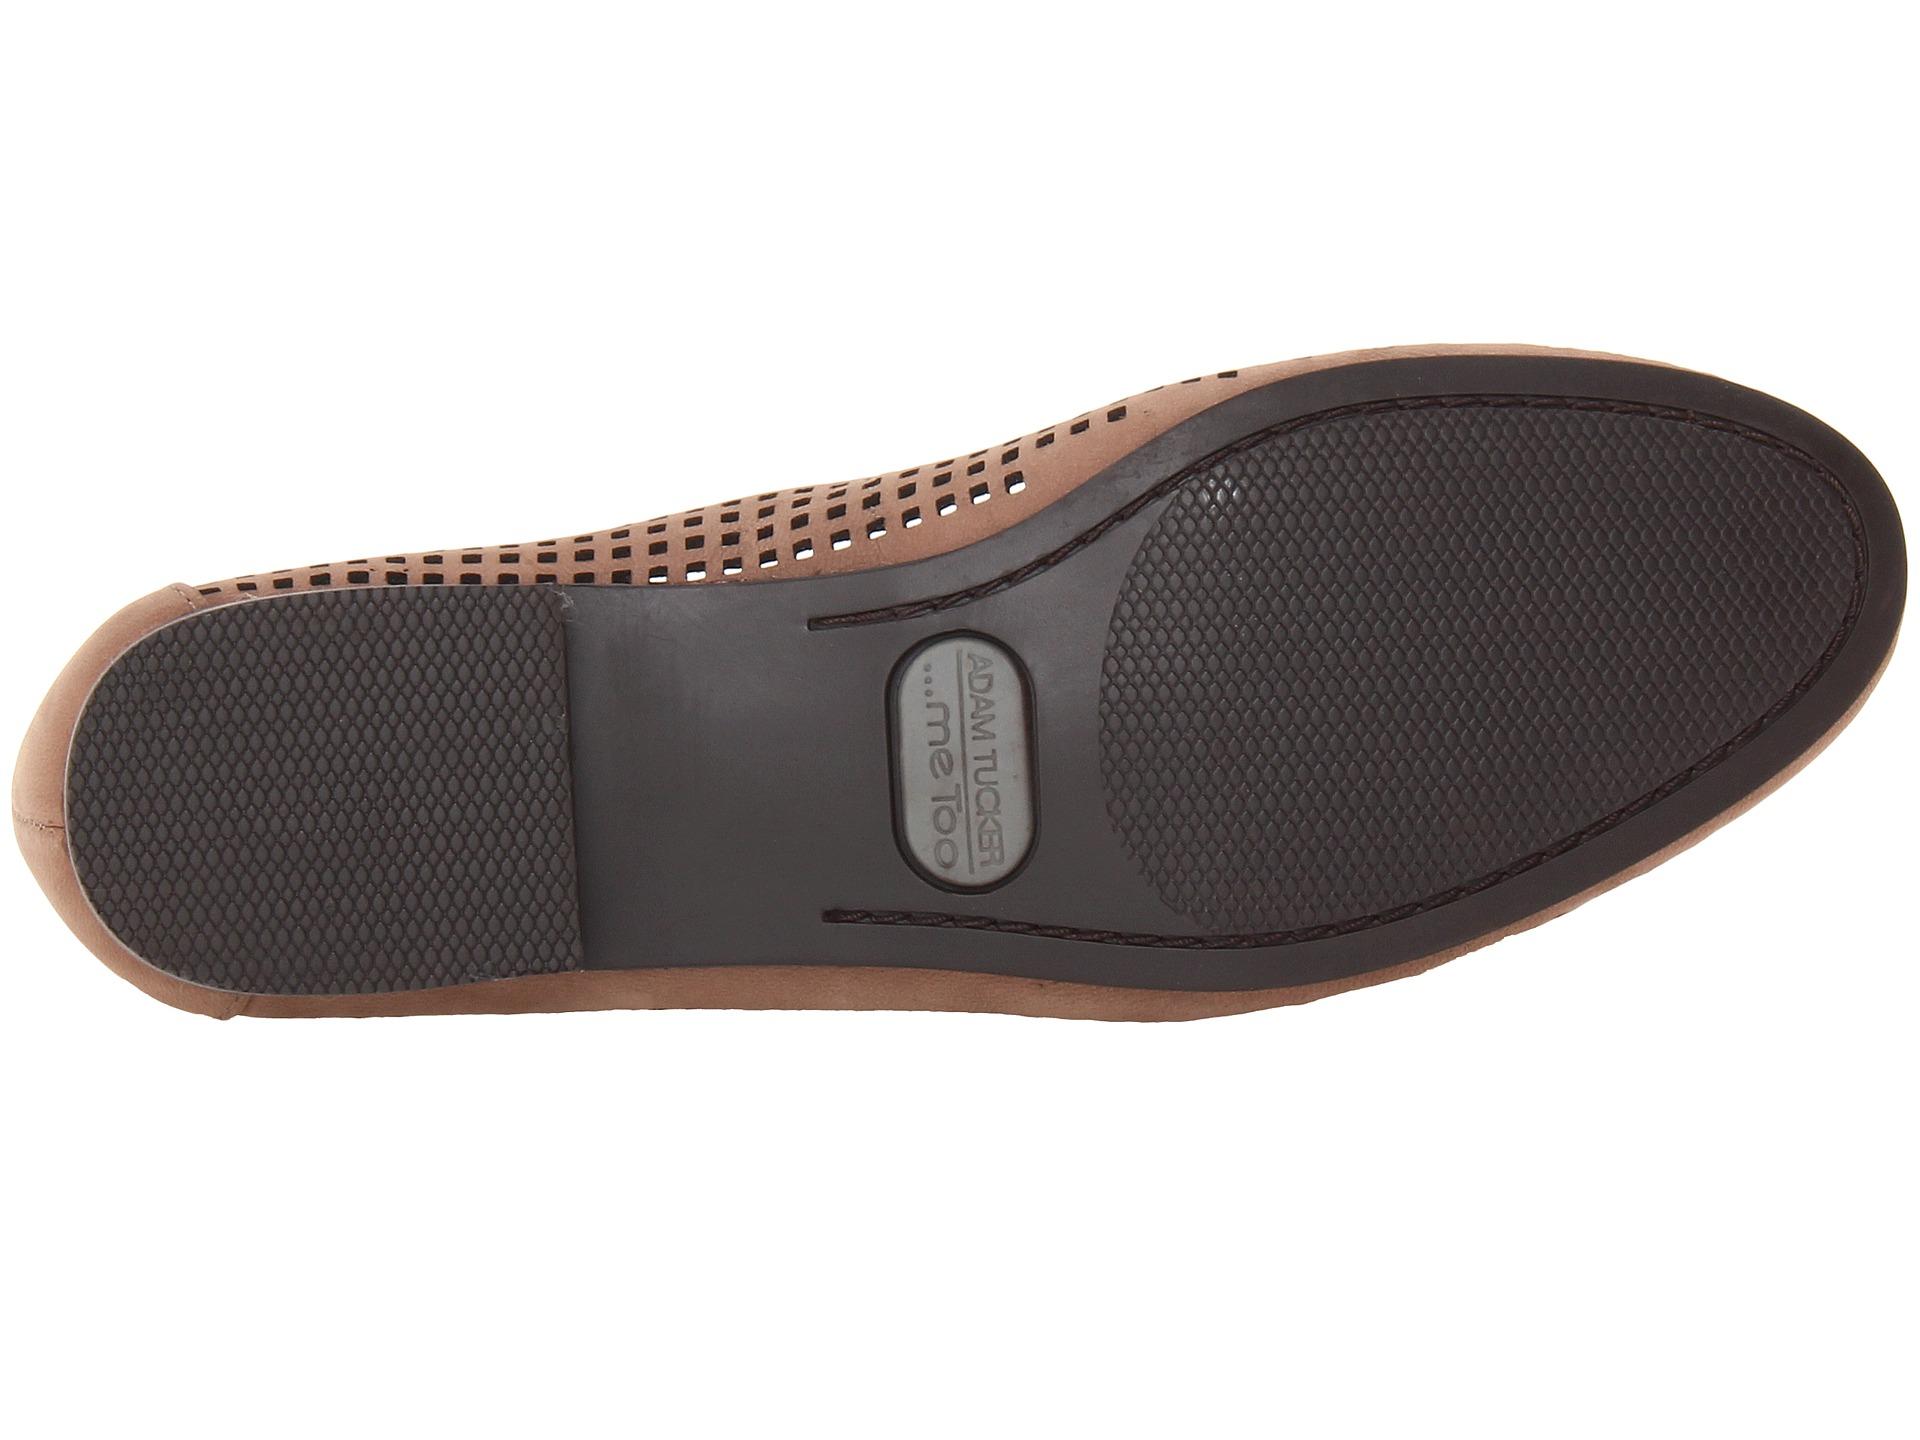 aerosole sandals me too sandals zappos